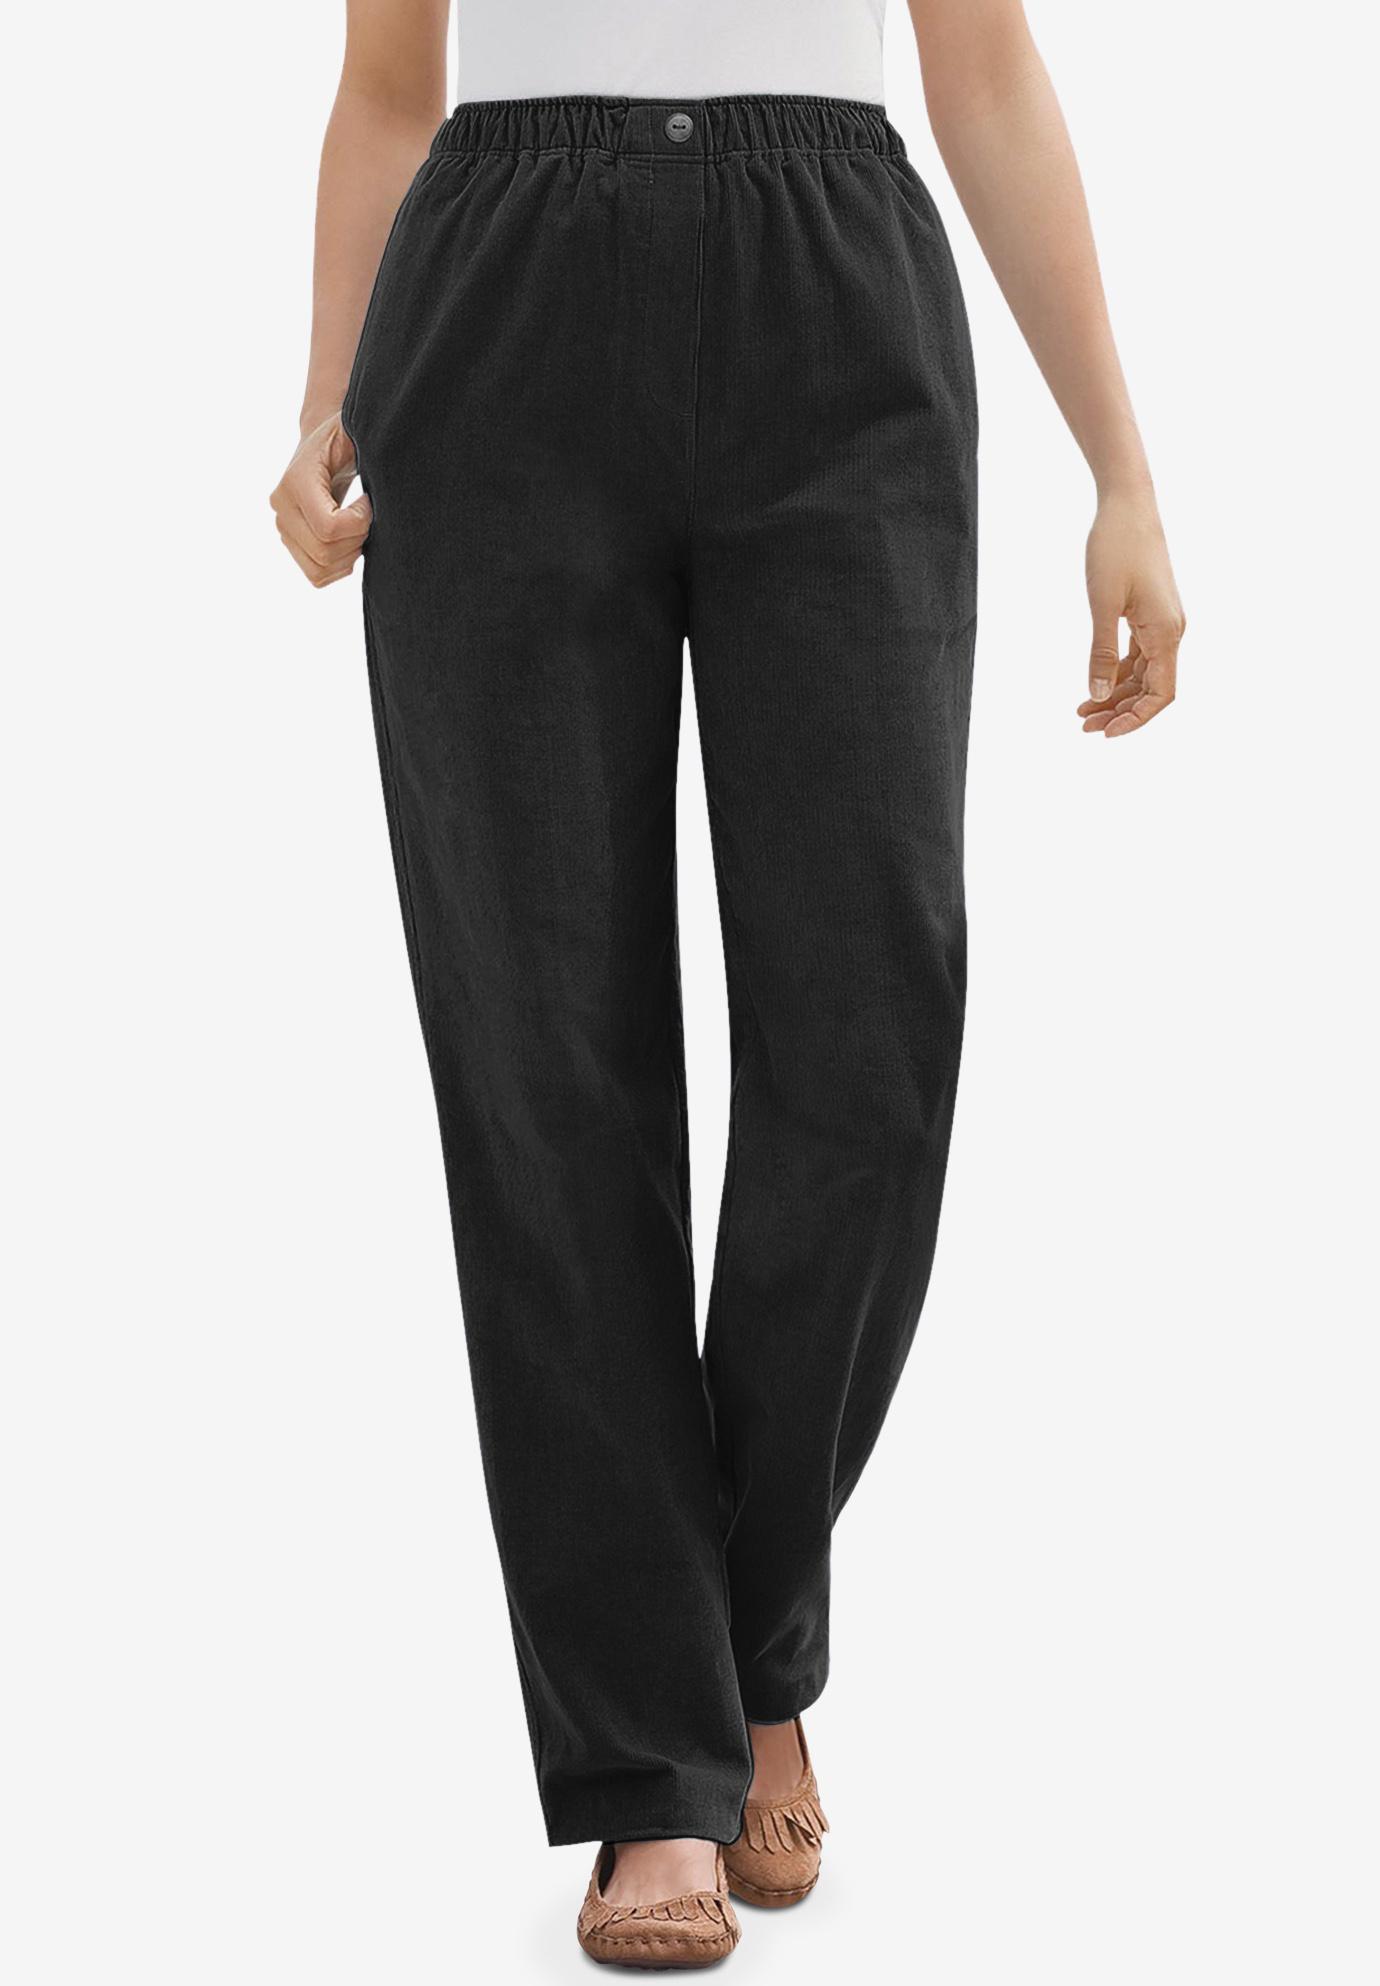 c7ac8f2b9f2 Comfort Waist Straight Leg Corduroy Pant| Plus Size Casual Pants ...